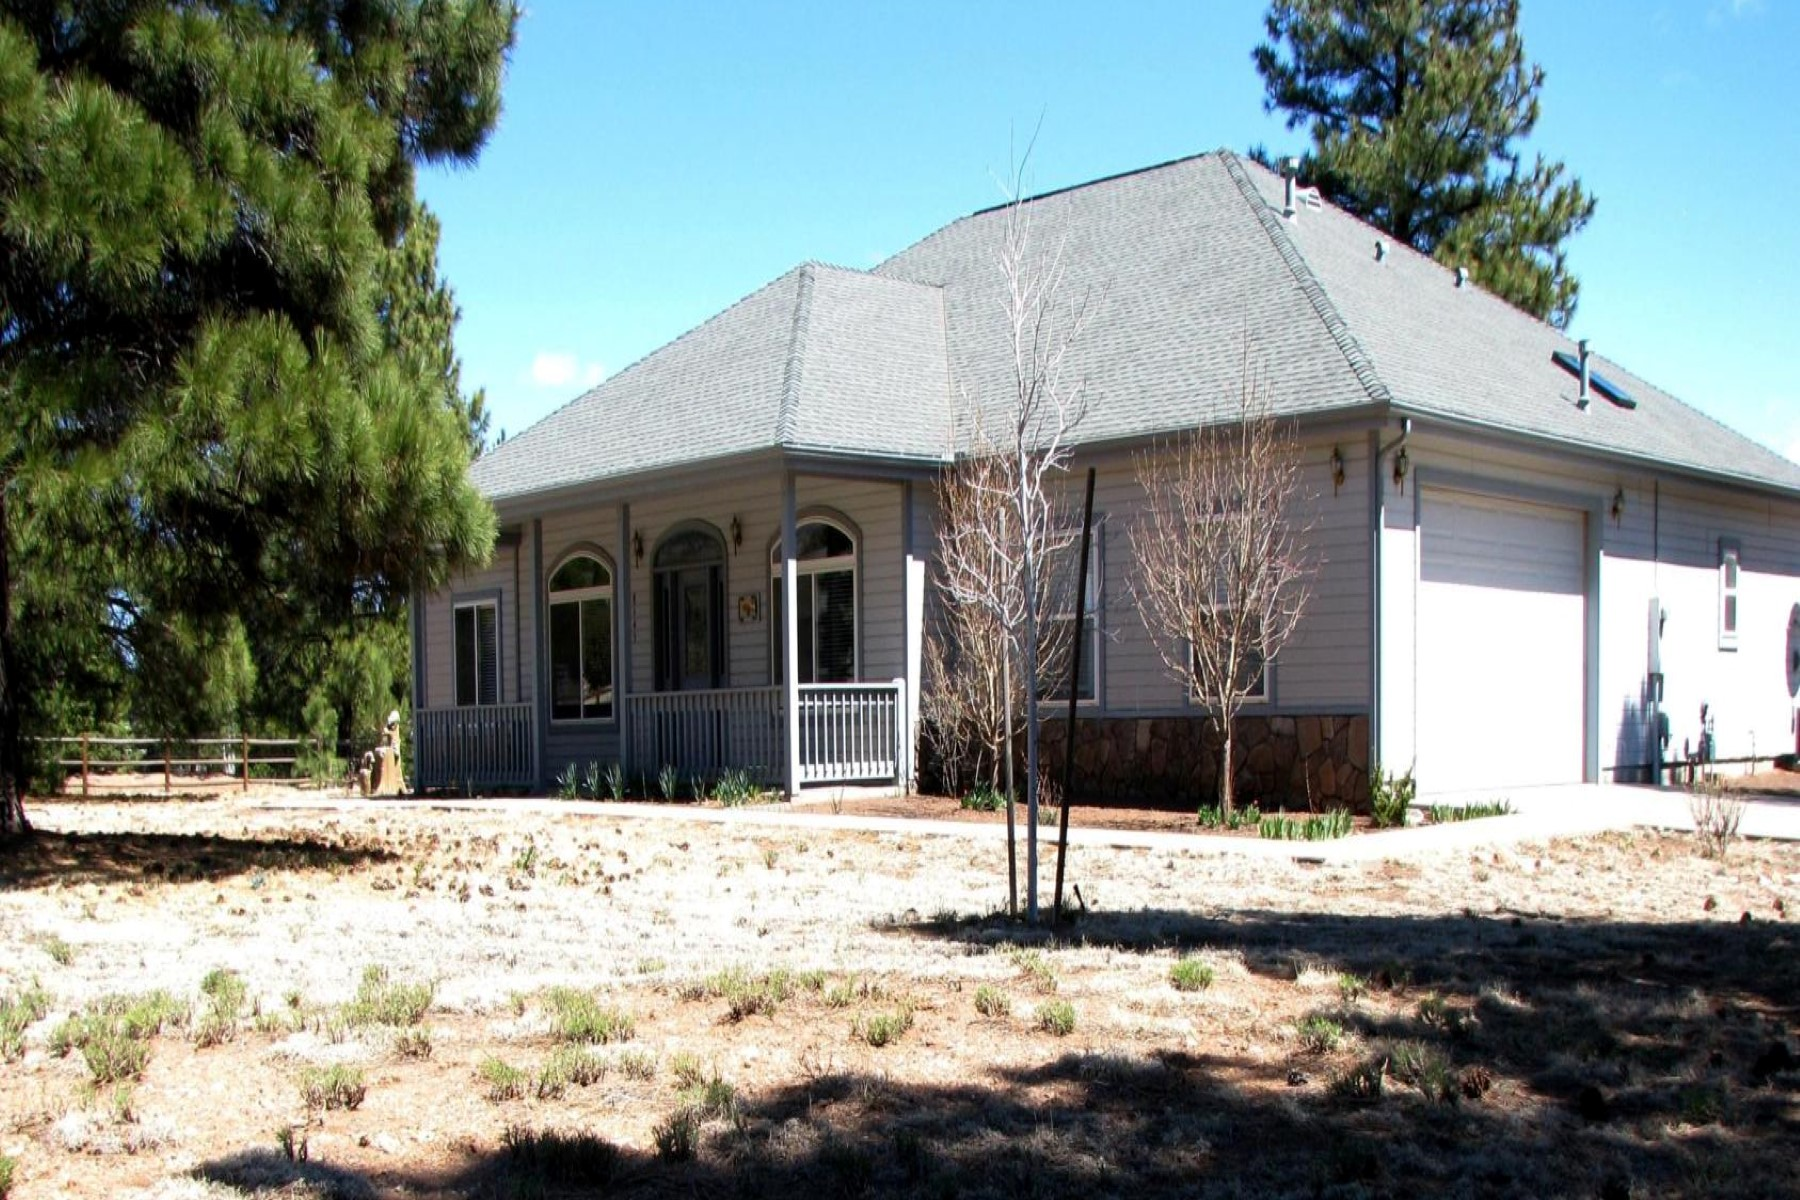 獨棟家庭住宅 為 出售 在 Beautiful equestrian property 8145 N Winchester Dr Flagstaff, 亞利桑那州, 86004 美國